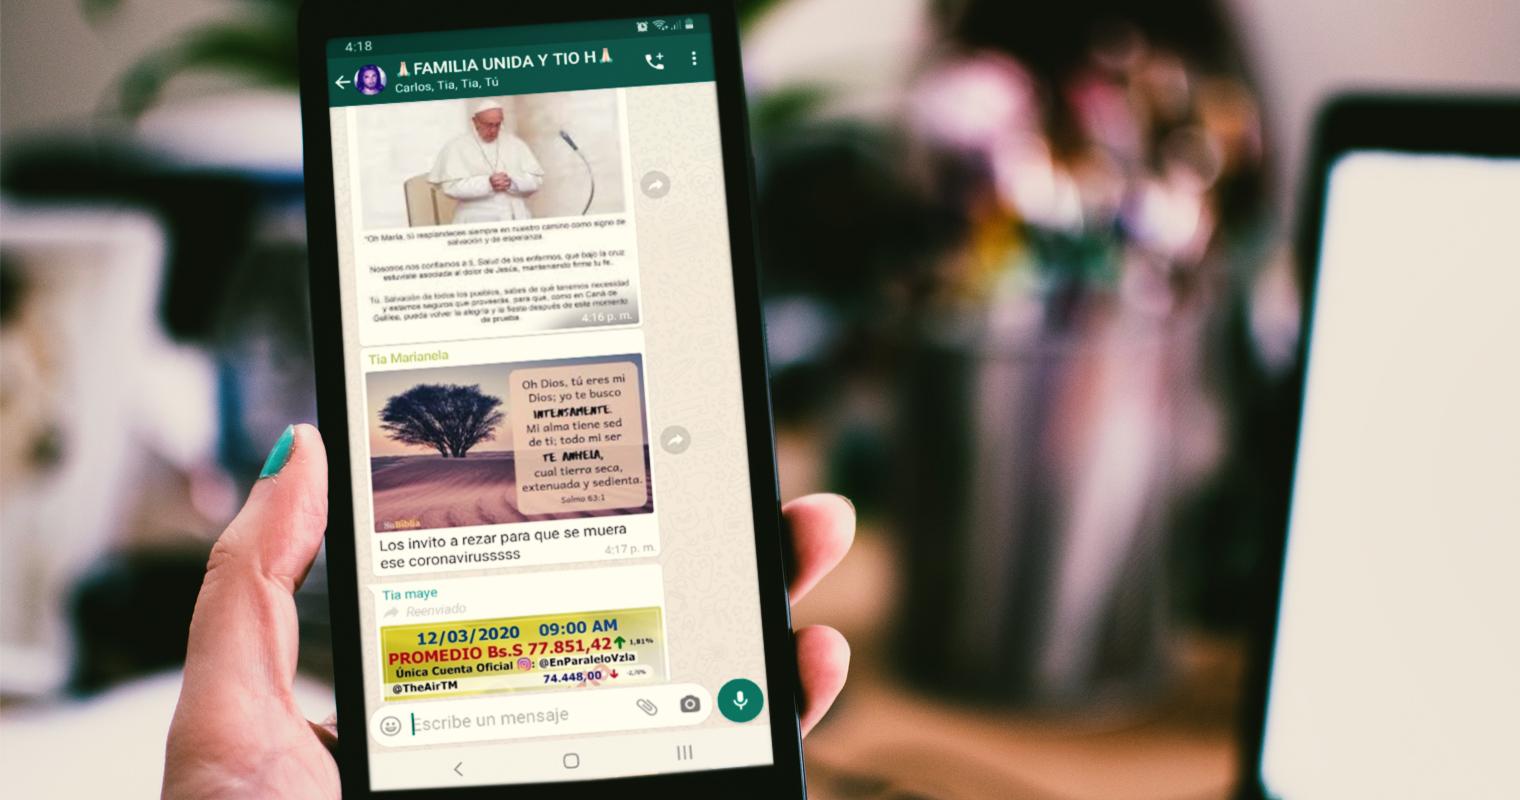 Grupo de Whatsapp de la familia descubre origen, causa, y cura del Coronavirus